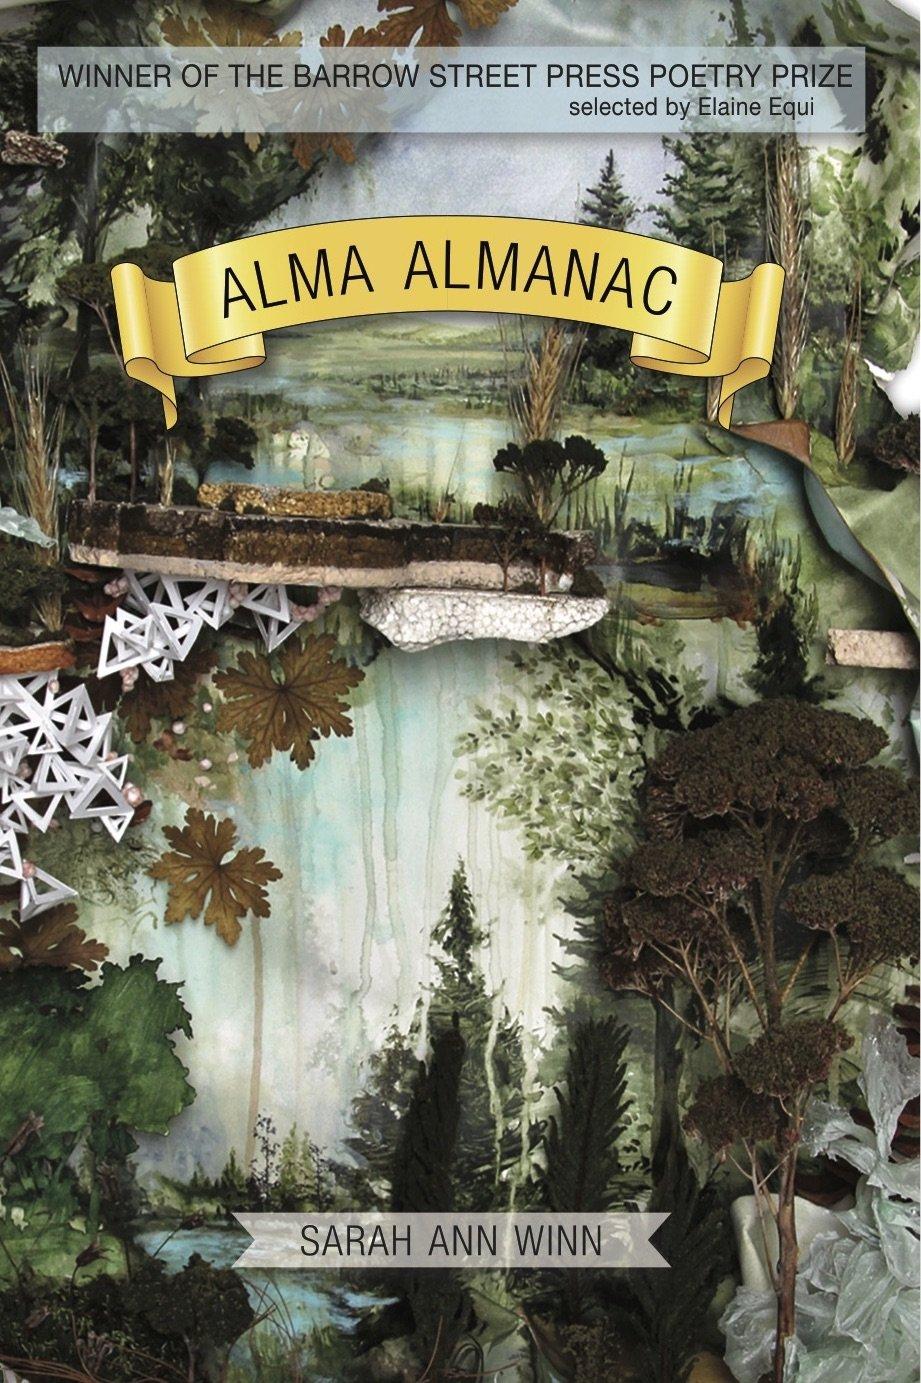 Alma Almanac (9780997318456): Winn, Sarah Ann: Books - Amazon.com